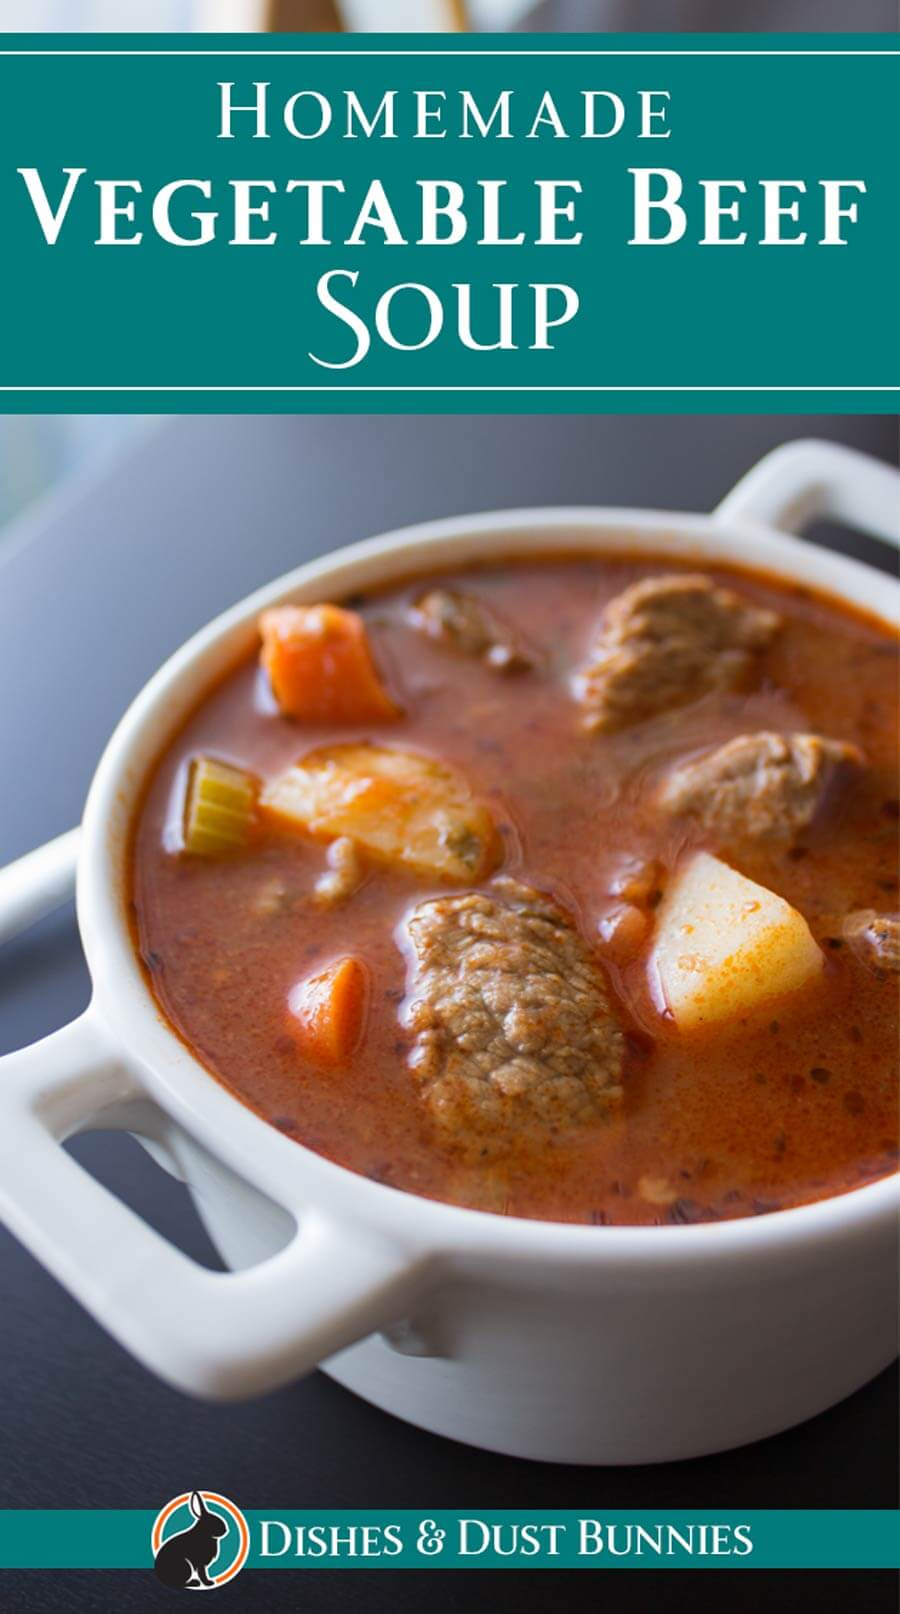 Homemade Vegetable Beef Soup via @mvdustbunnies